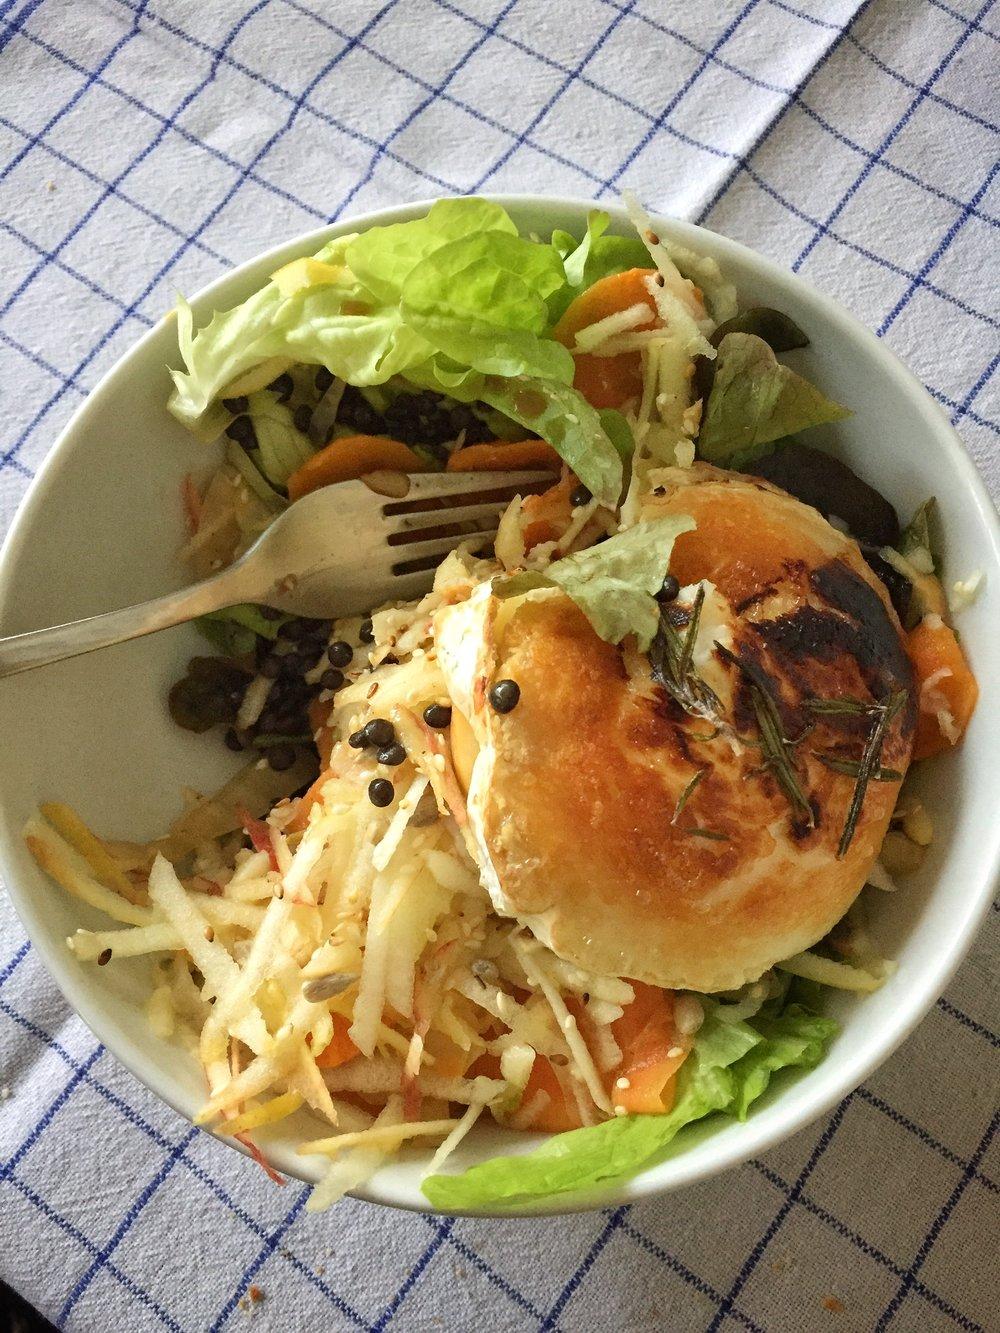 lentil salad with fennel, carrots, apples, and goat cheese at Café Johanna (Hamburg)